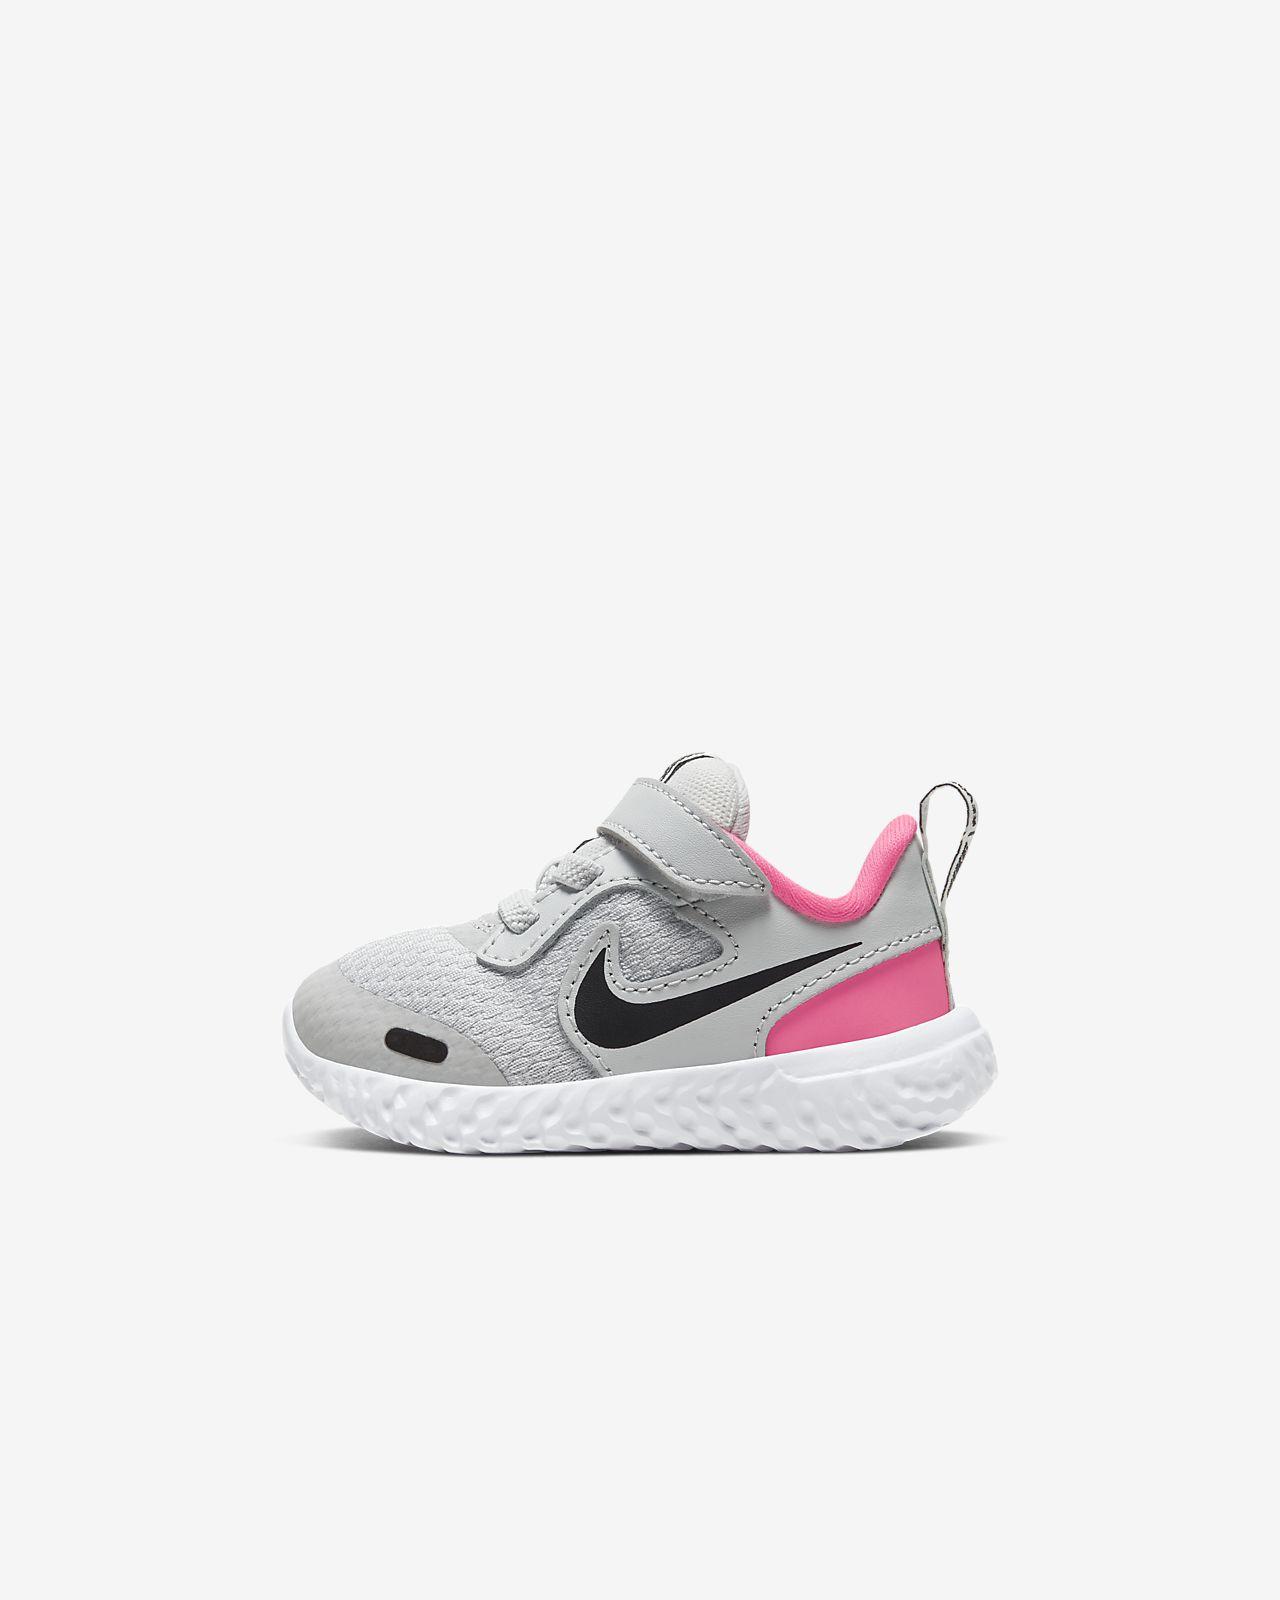 Sko Nike Revolution 5 f?r babysm? barn